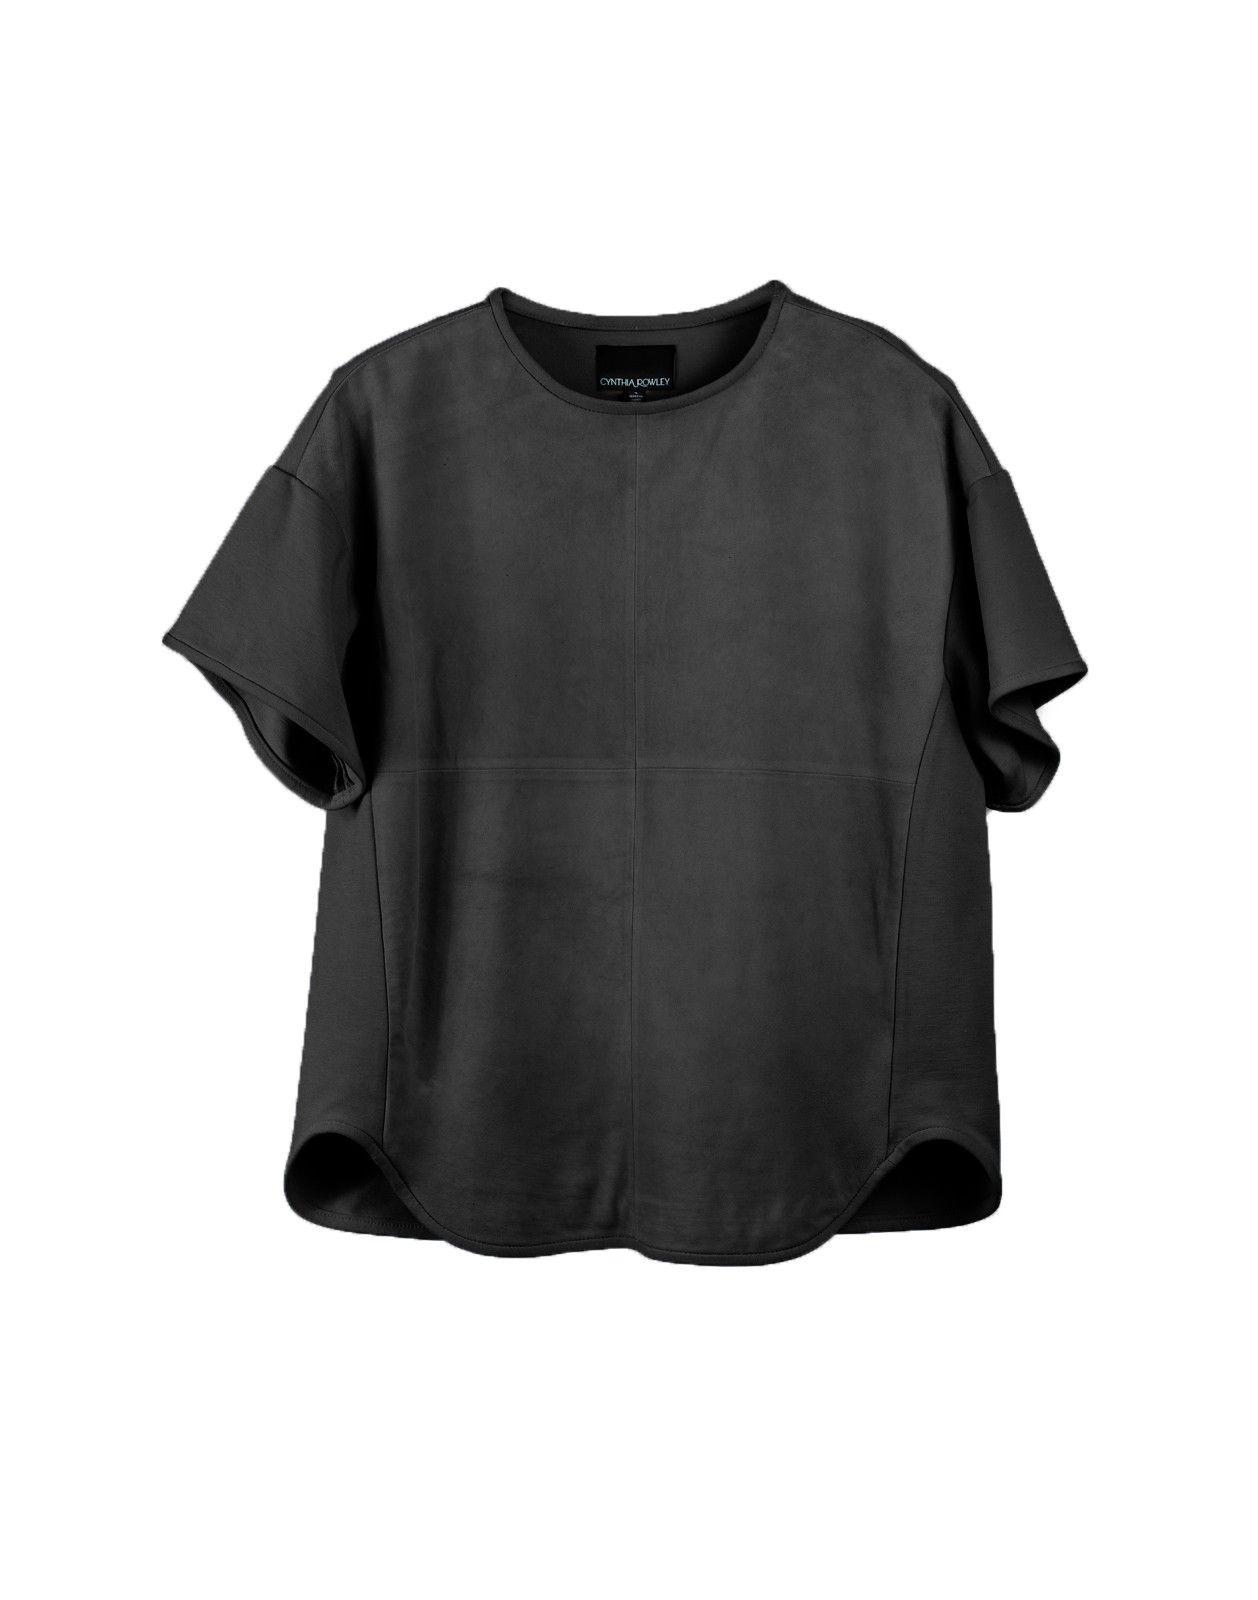 b7bc8696dc3a Cynthia Rowley - Suede Sweatshirt Tee | Looks We Love | Pinterest ...